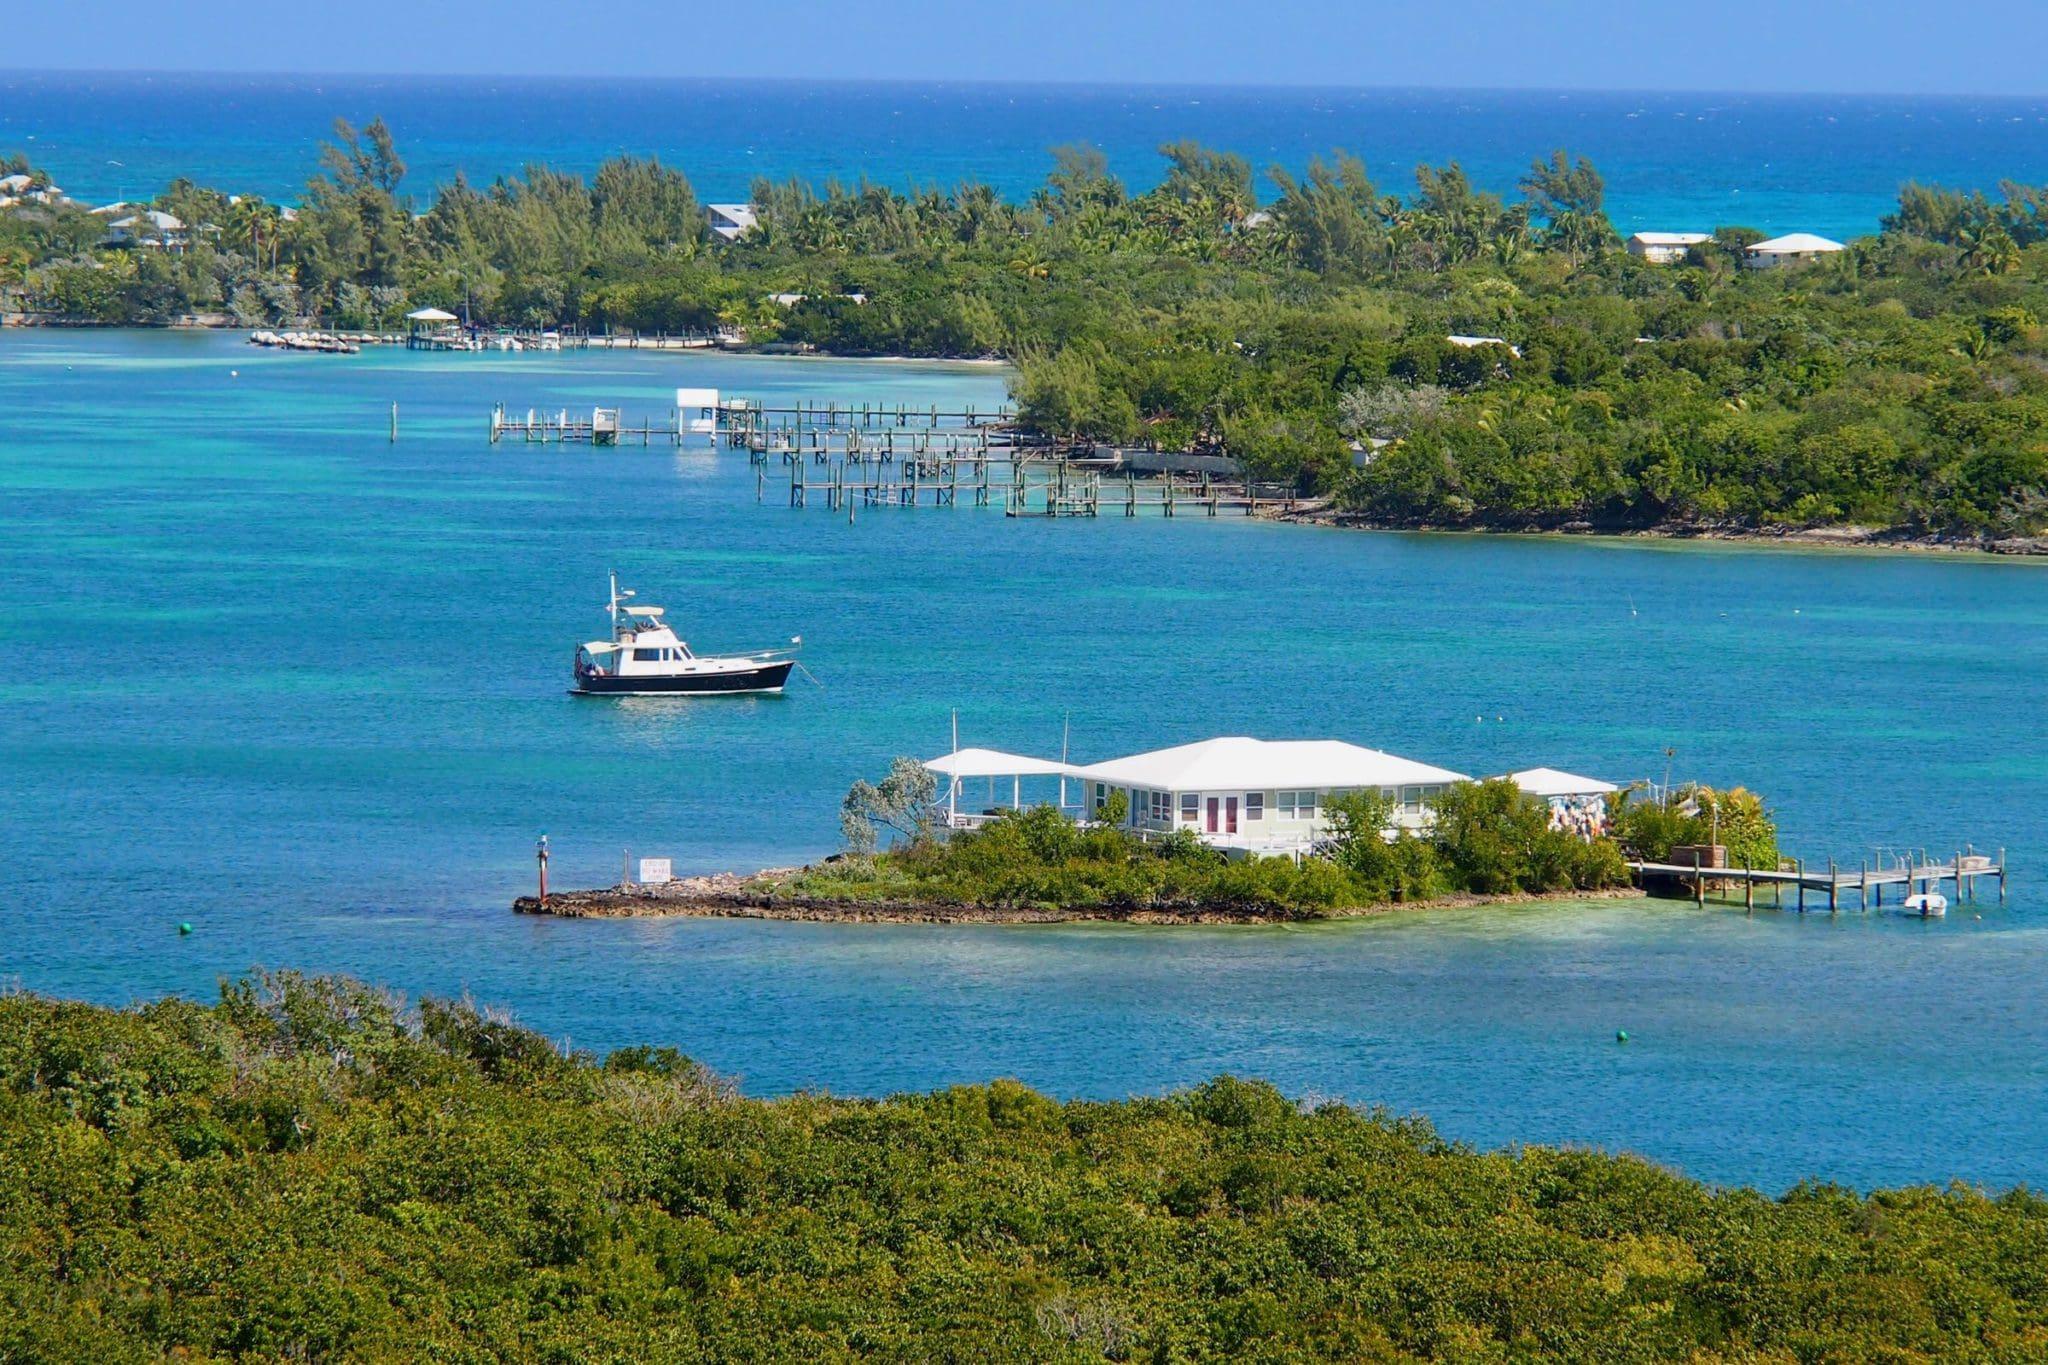 Far Away, So Close Private Island Bliss at Eagle Rock Cay, The Bahamas